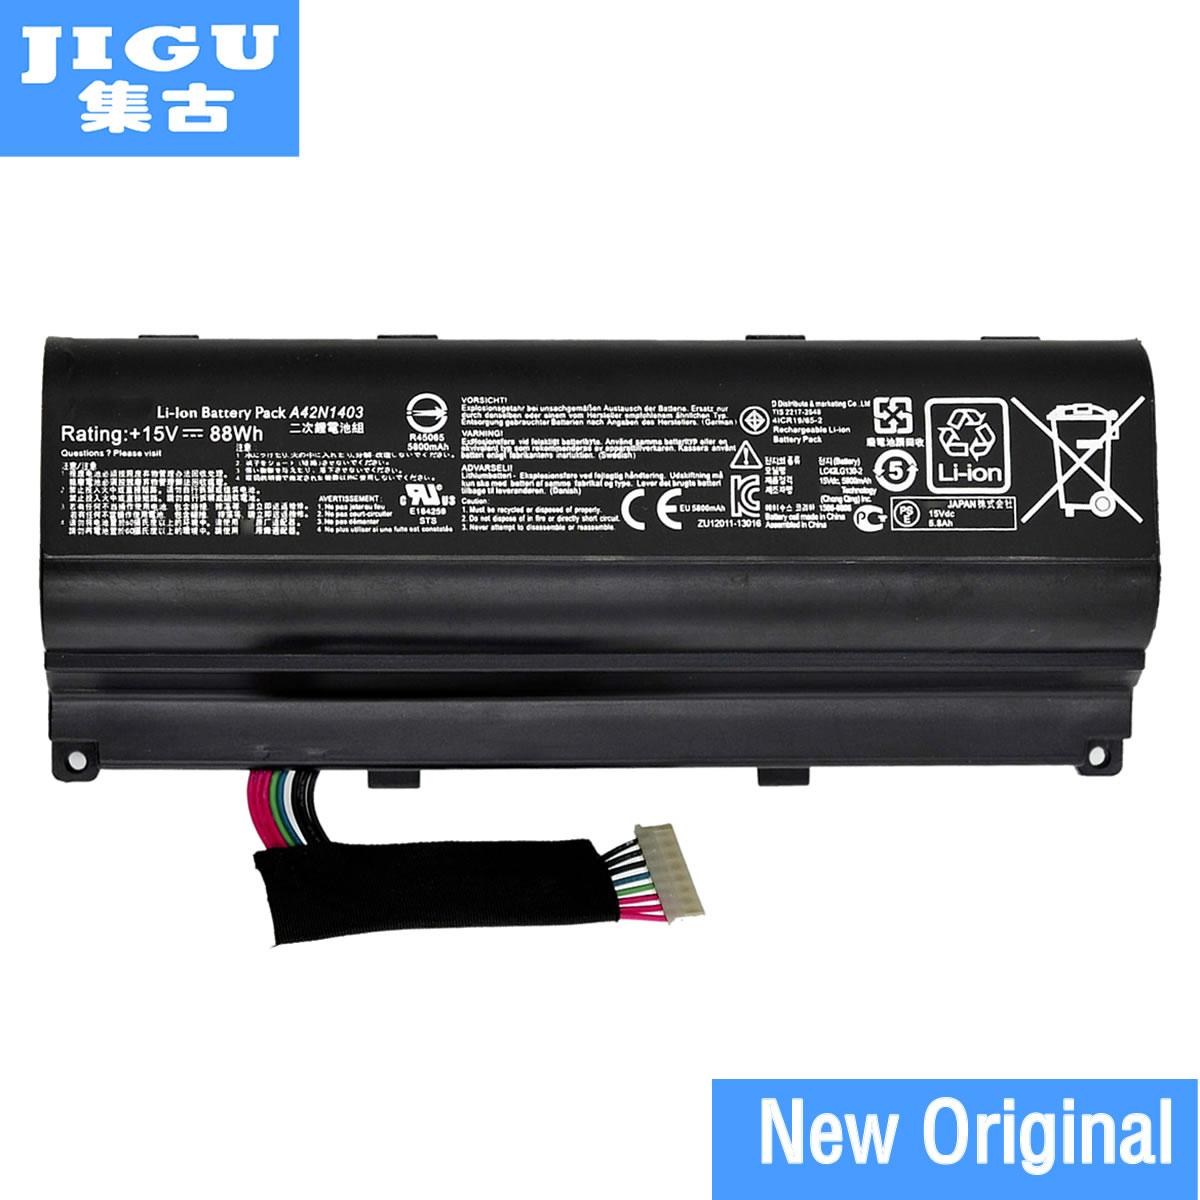 JIGU Original laptop battery for Asus ROG G751 G751J G751JM G751JY GFX71 GFX71J GFX71JM GFX71JY 15V 88WH